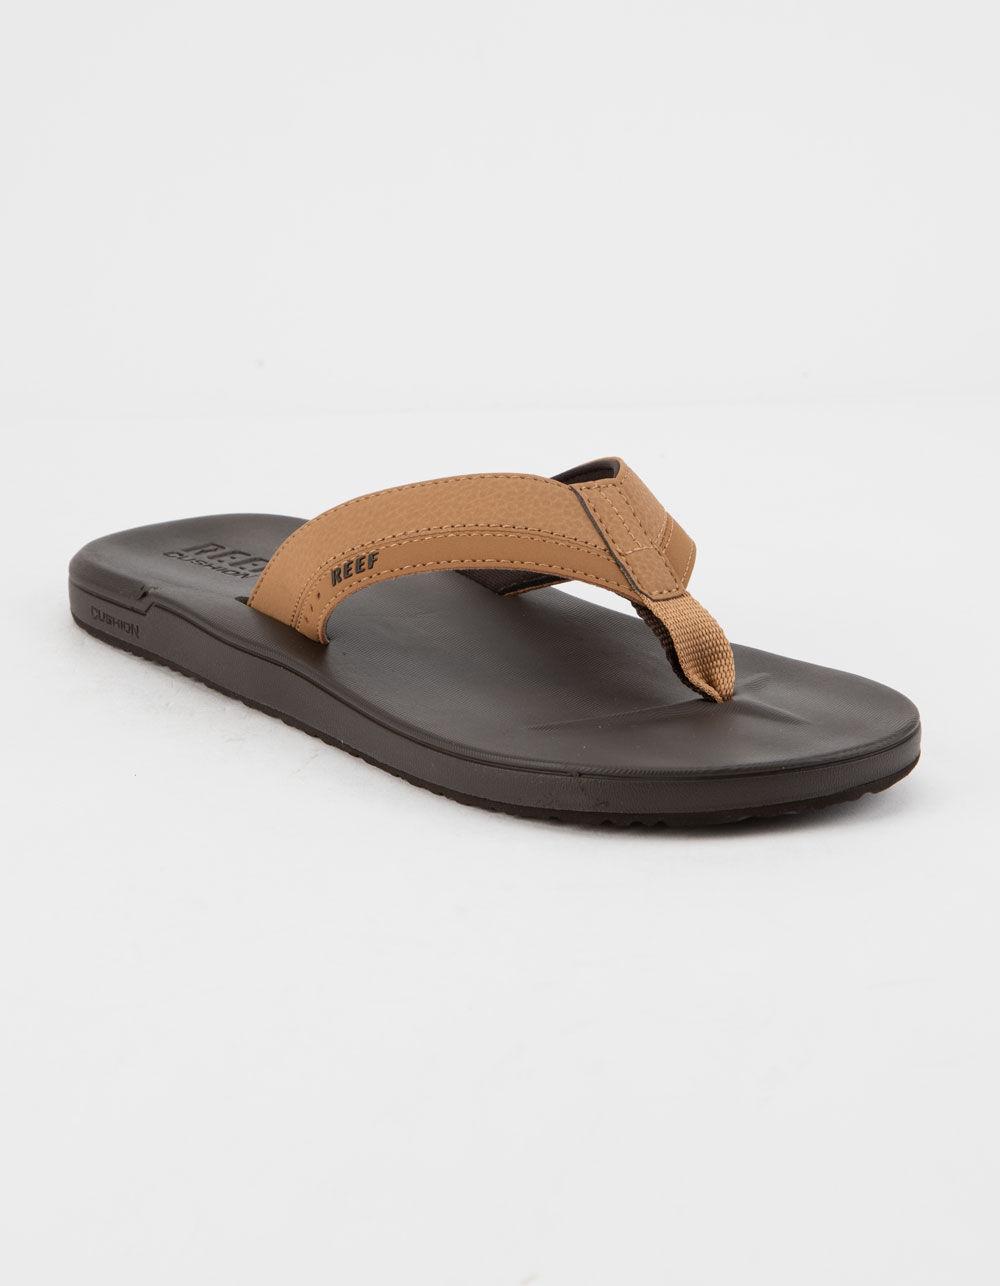 REEF Contoured Cushion Sandals